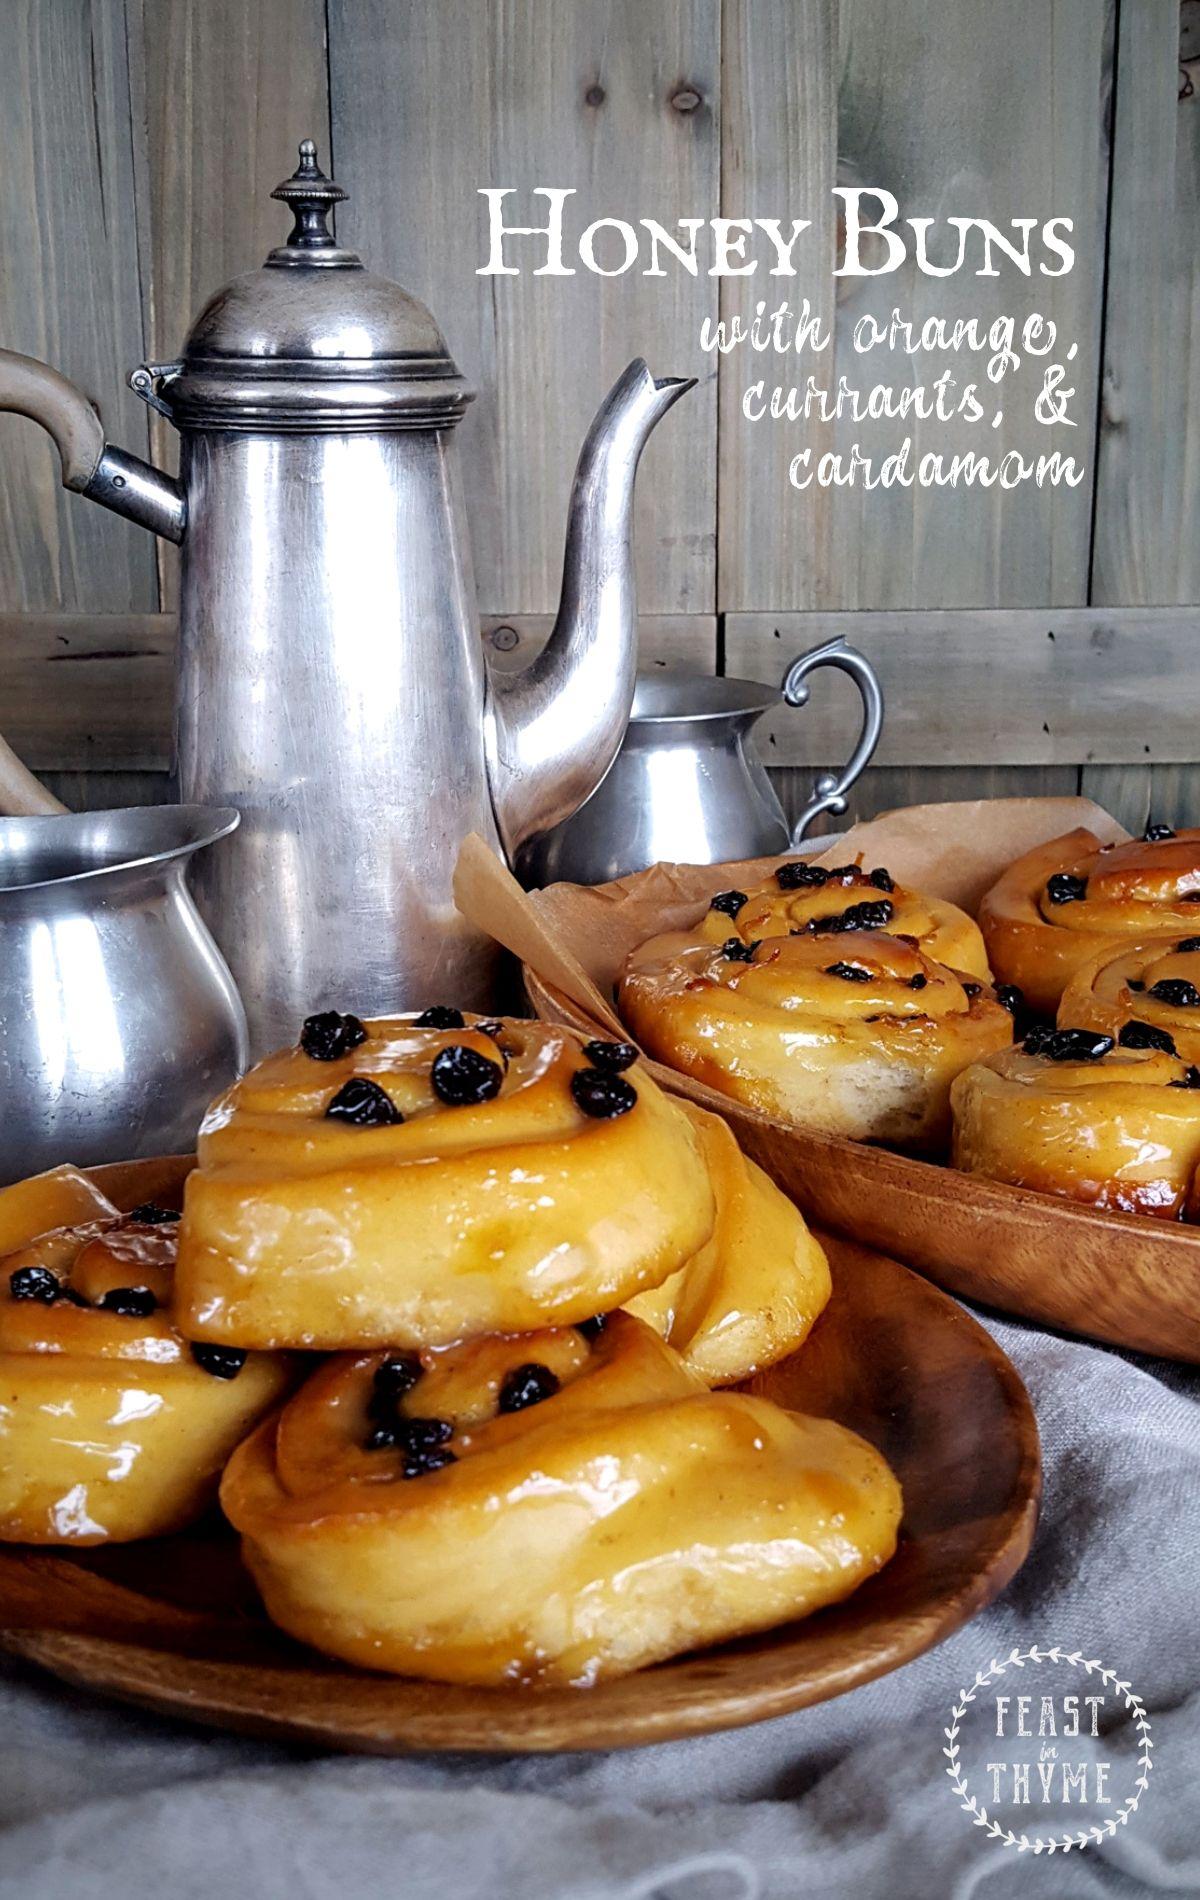 Honey Buns with Orange, Currants & Cardamom